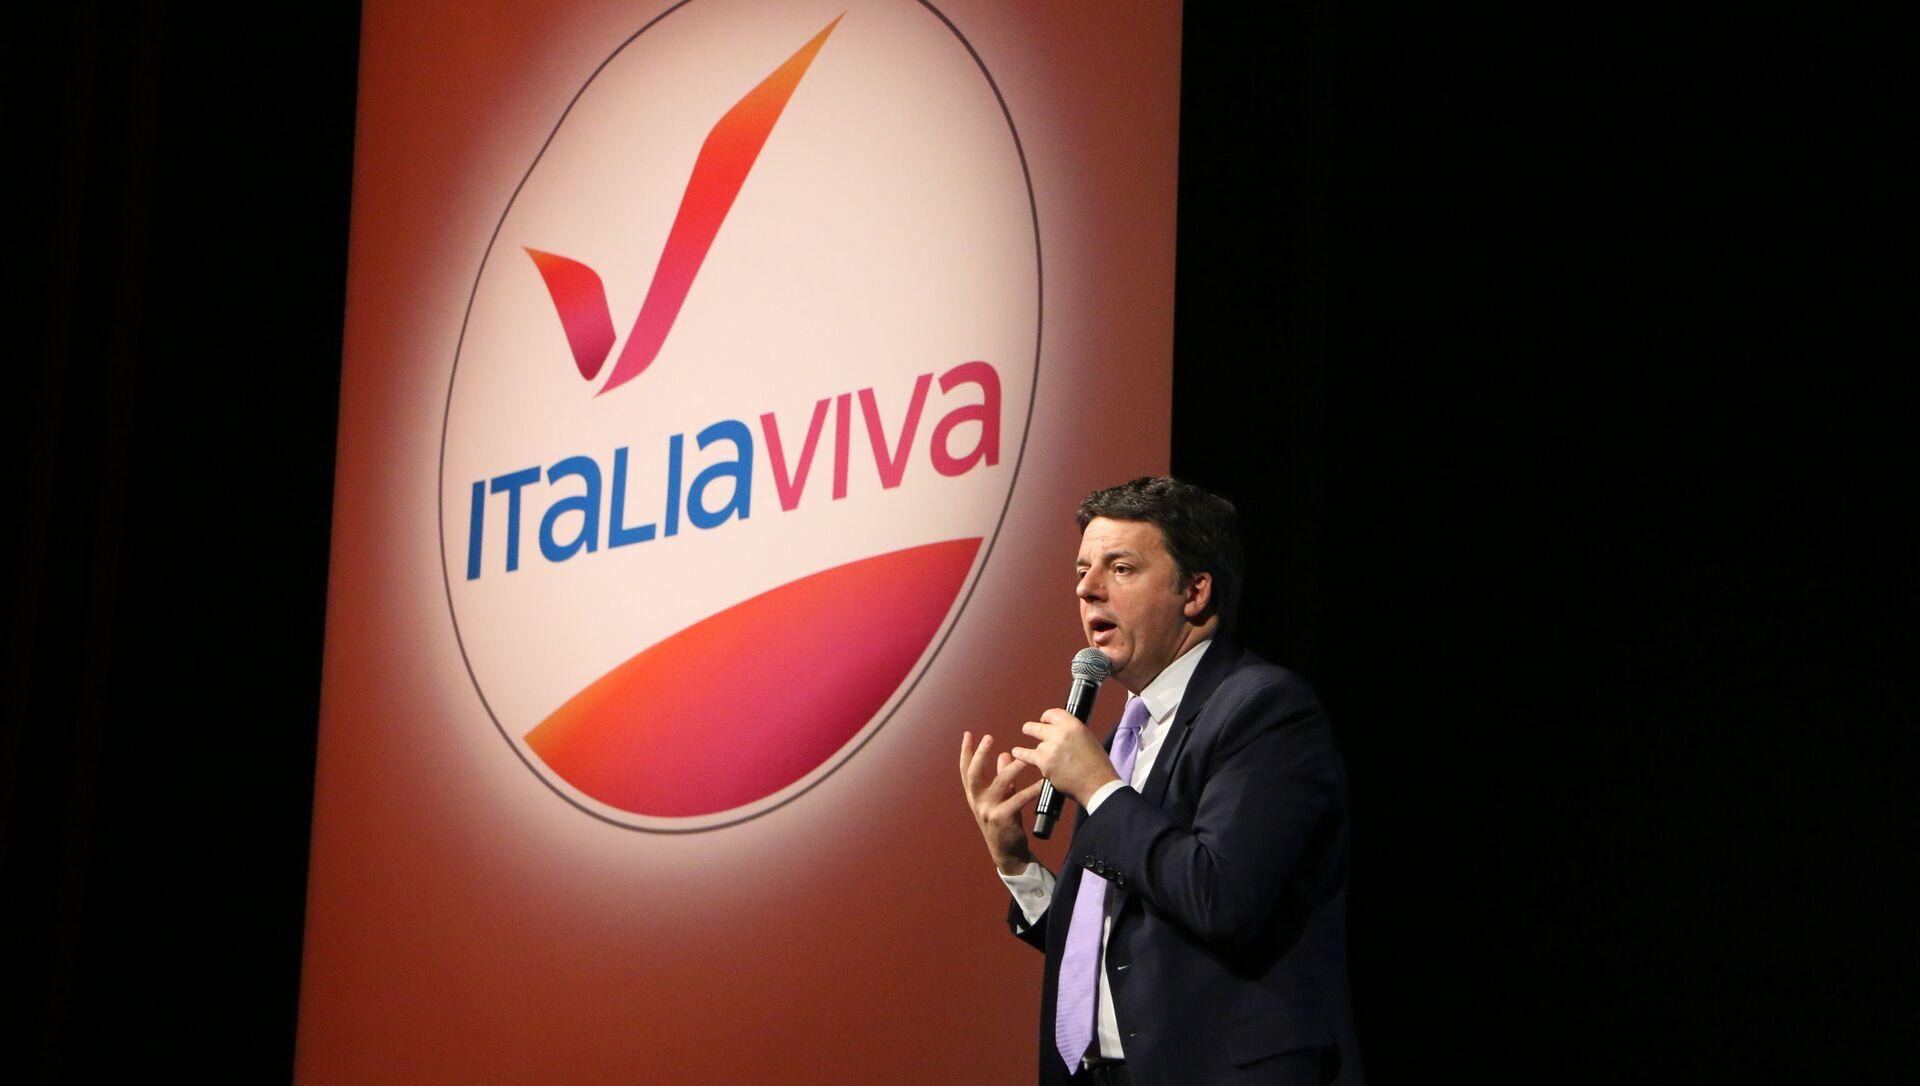 Matteo Renzi - Sputnik Italia, 1920, 20.03.2021